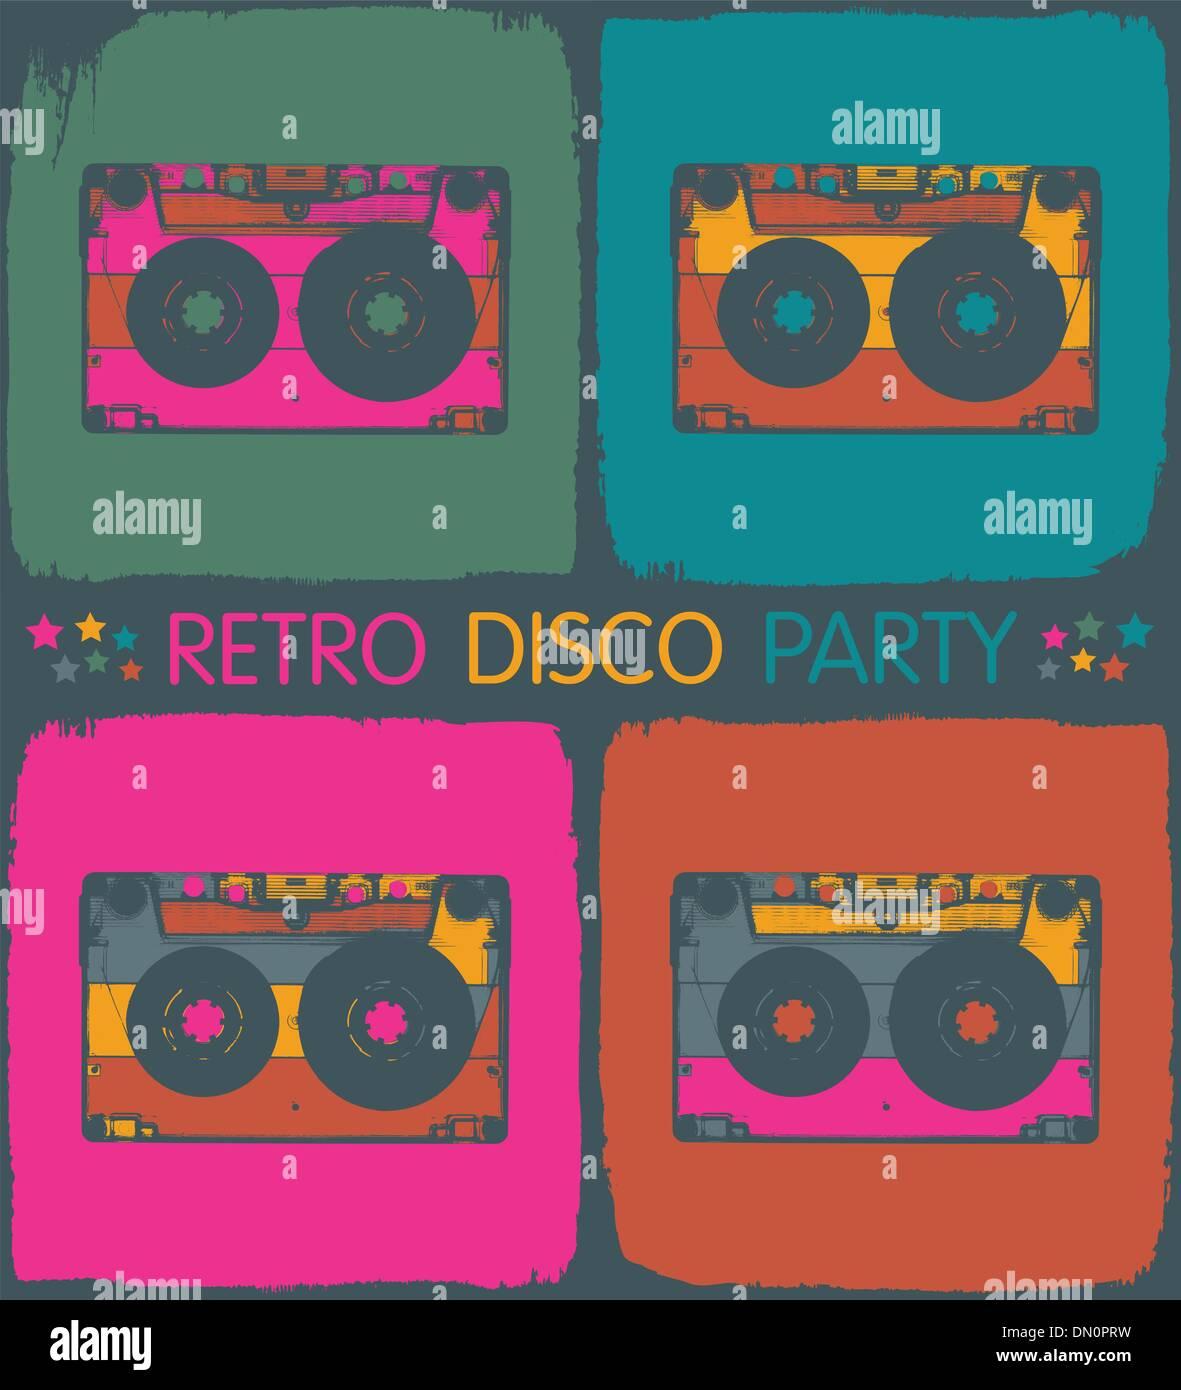 Retro disco party invitation in pop-art style. Vector, EPS8 - Stock Image